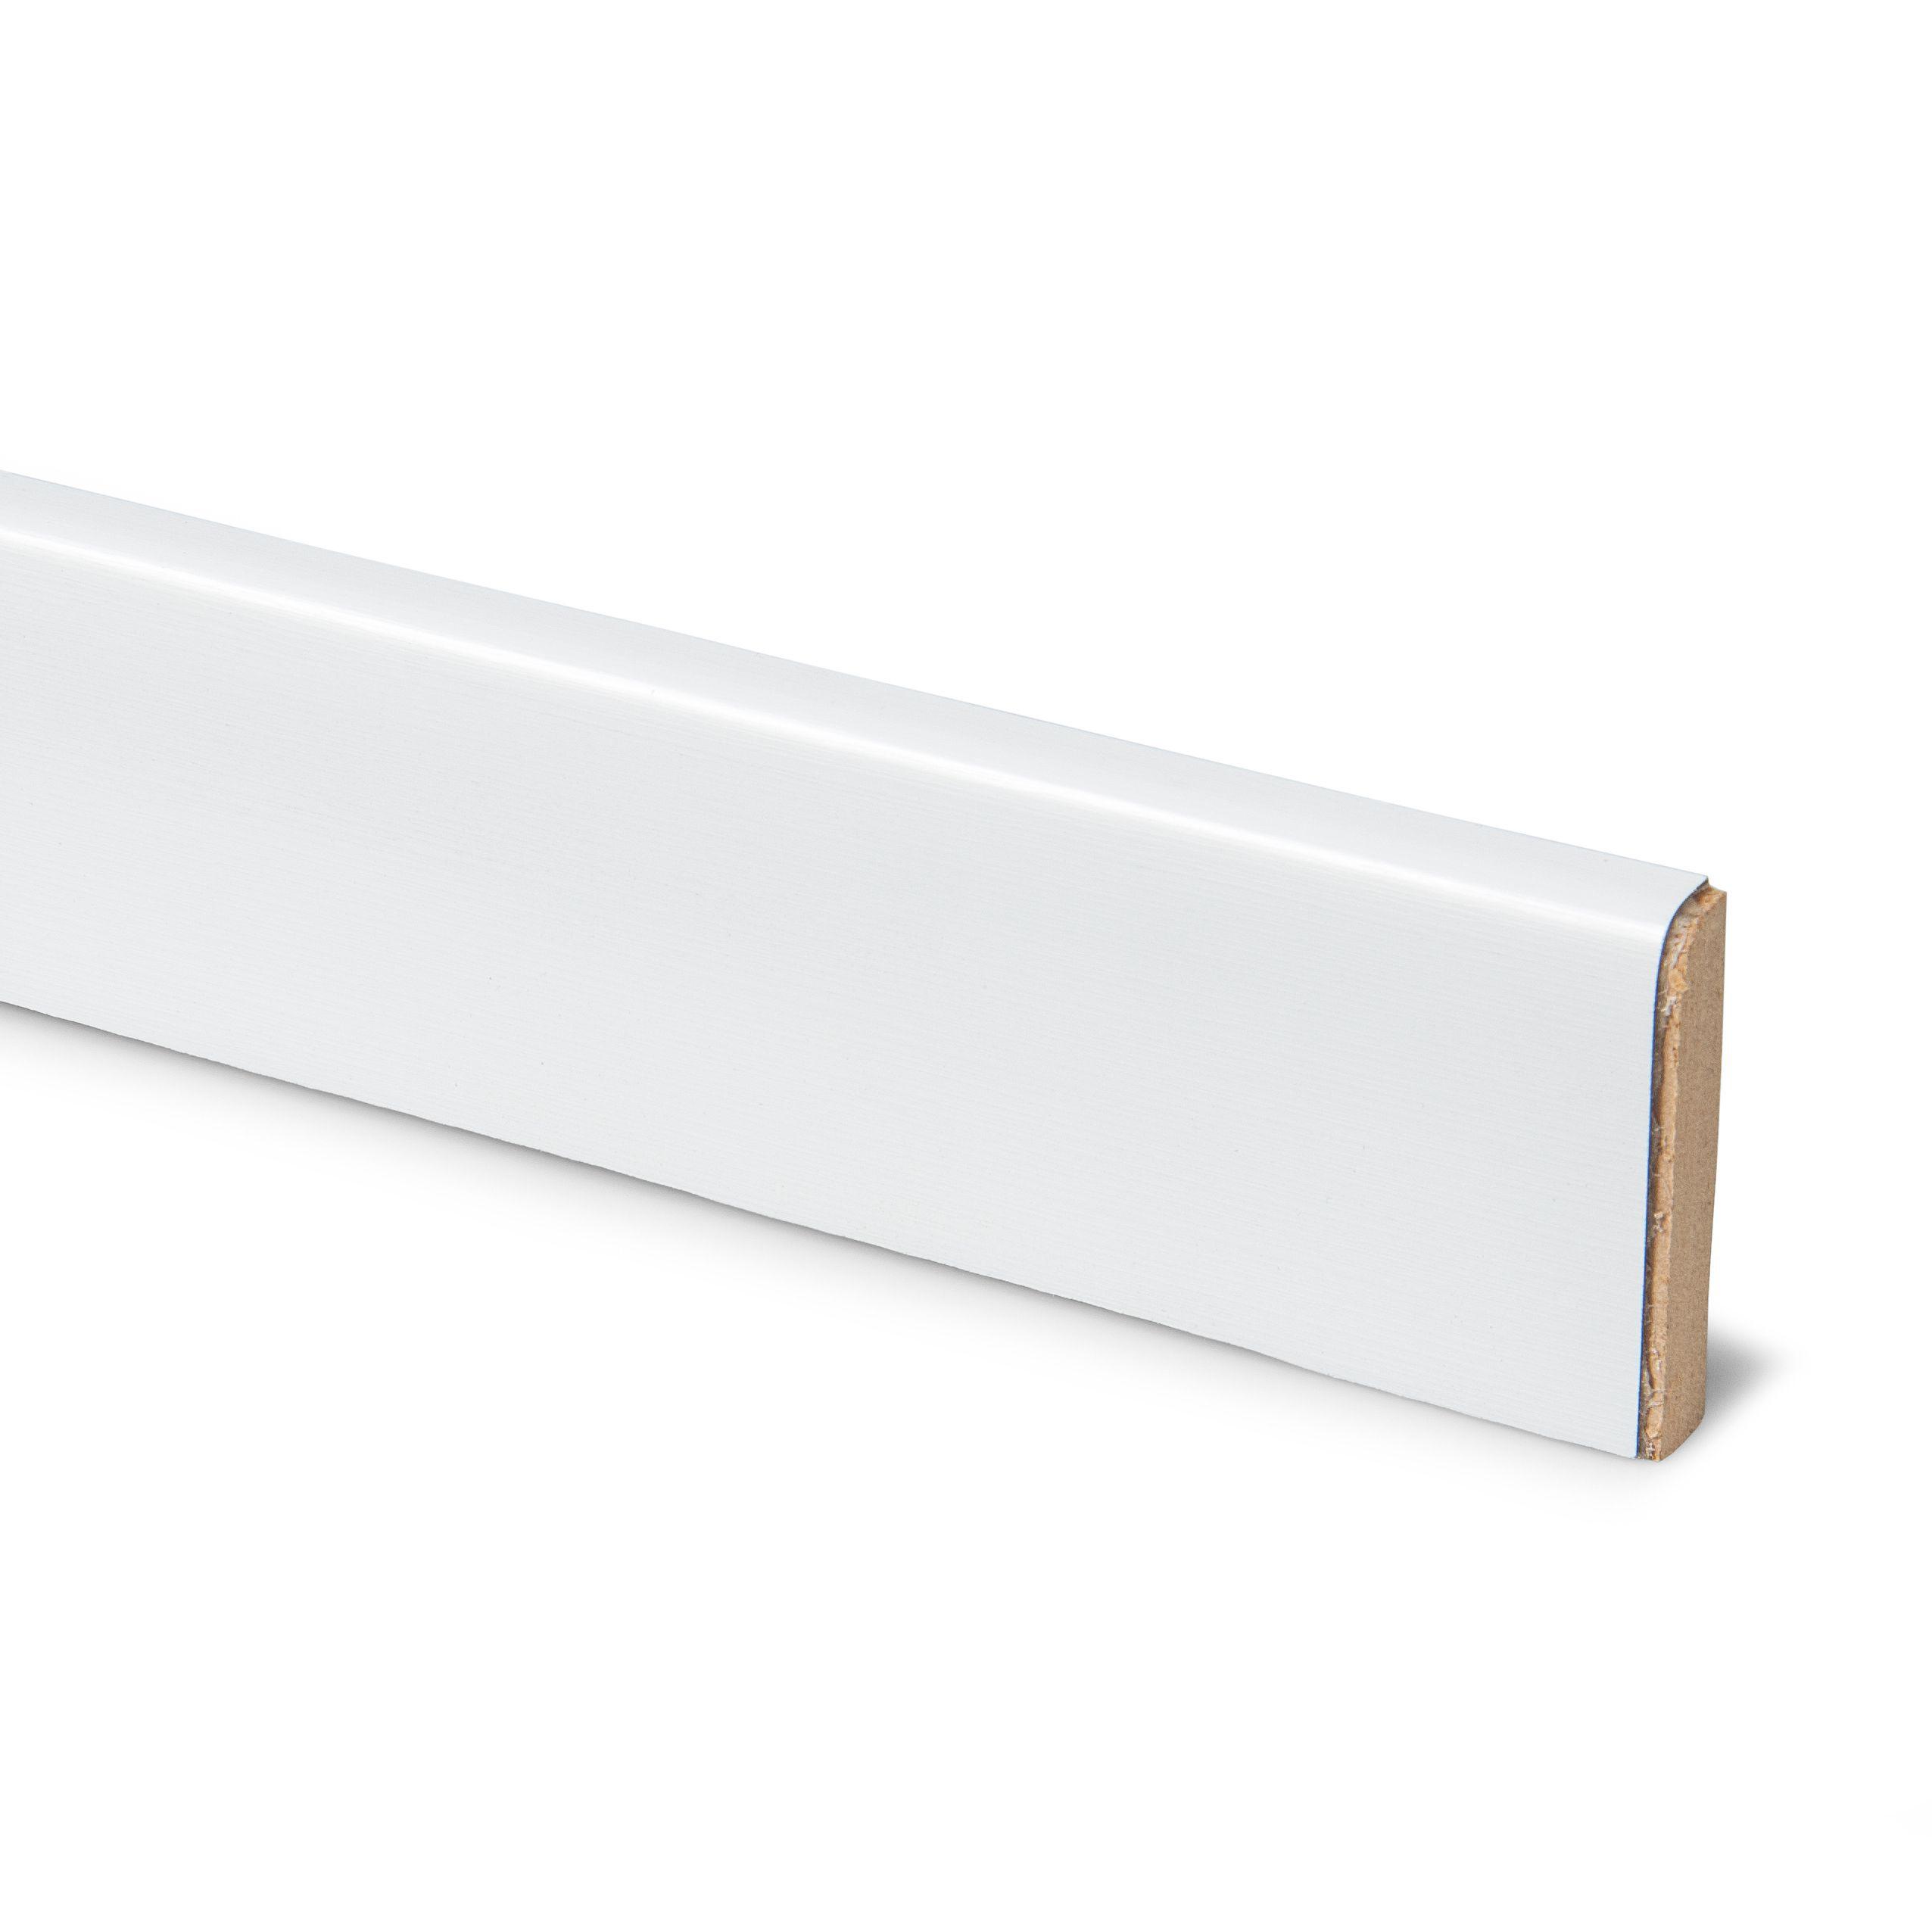 12mm Designer White Laminate Upstand   Departments   DIY at B&Q